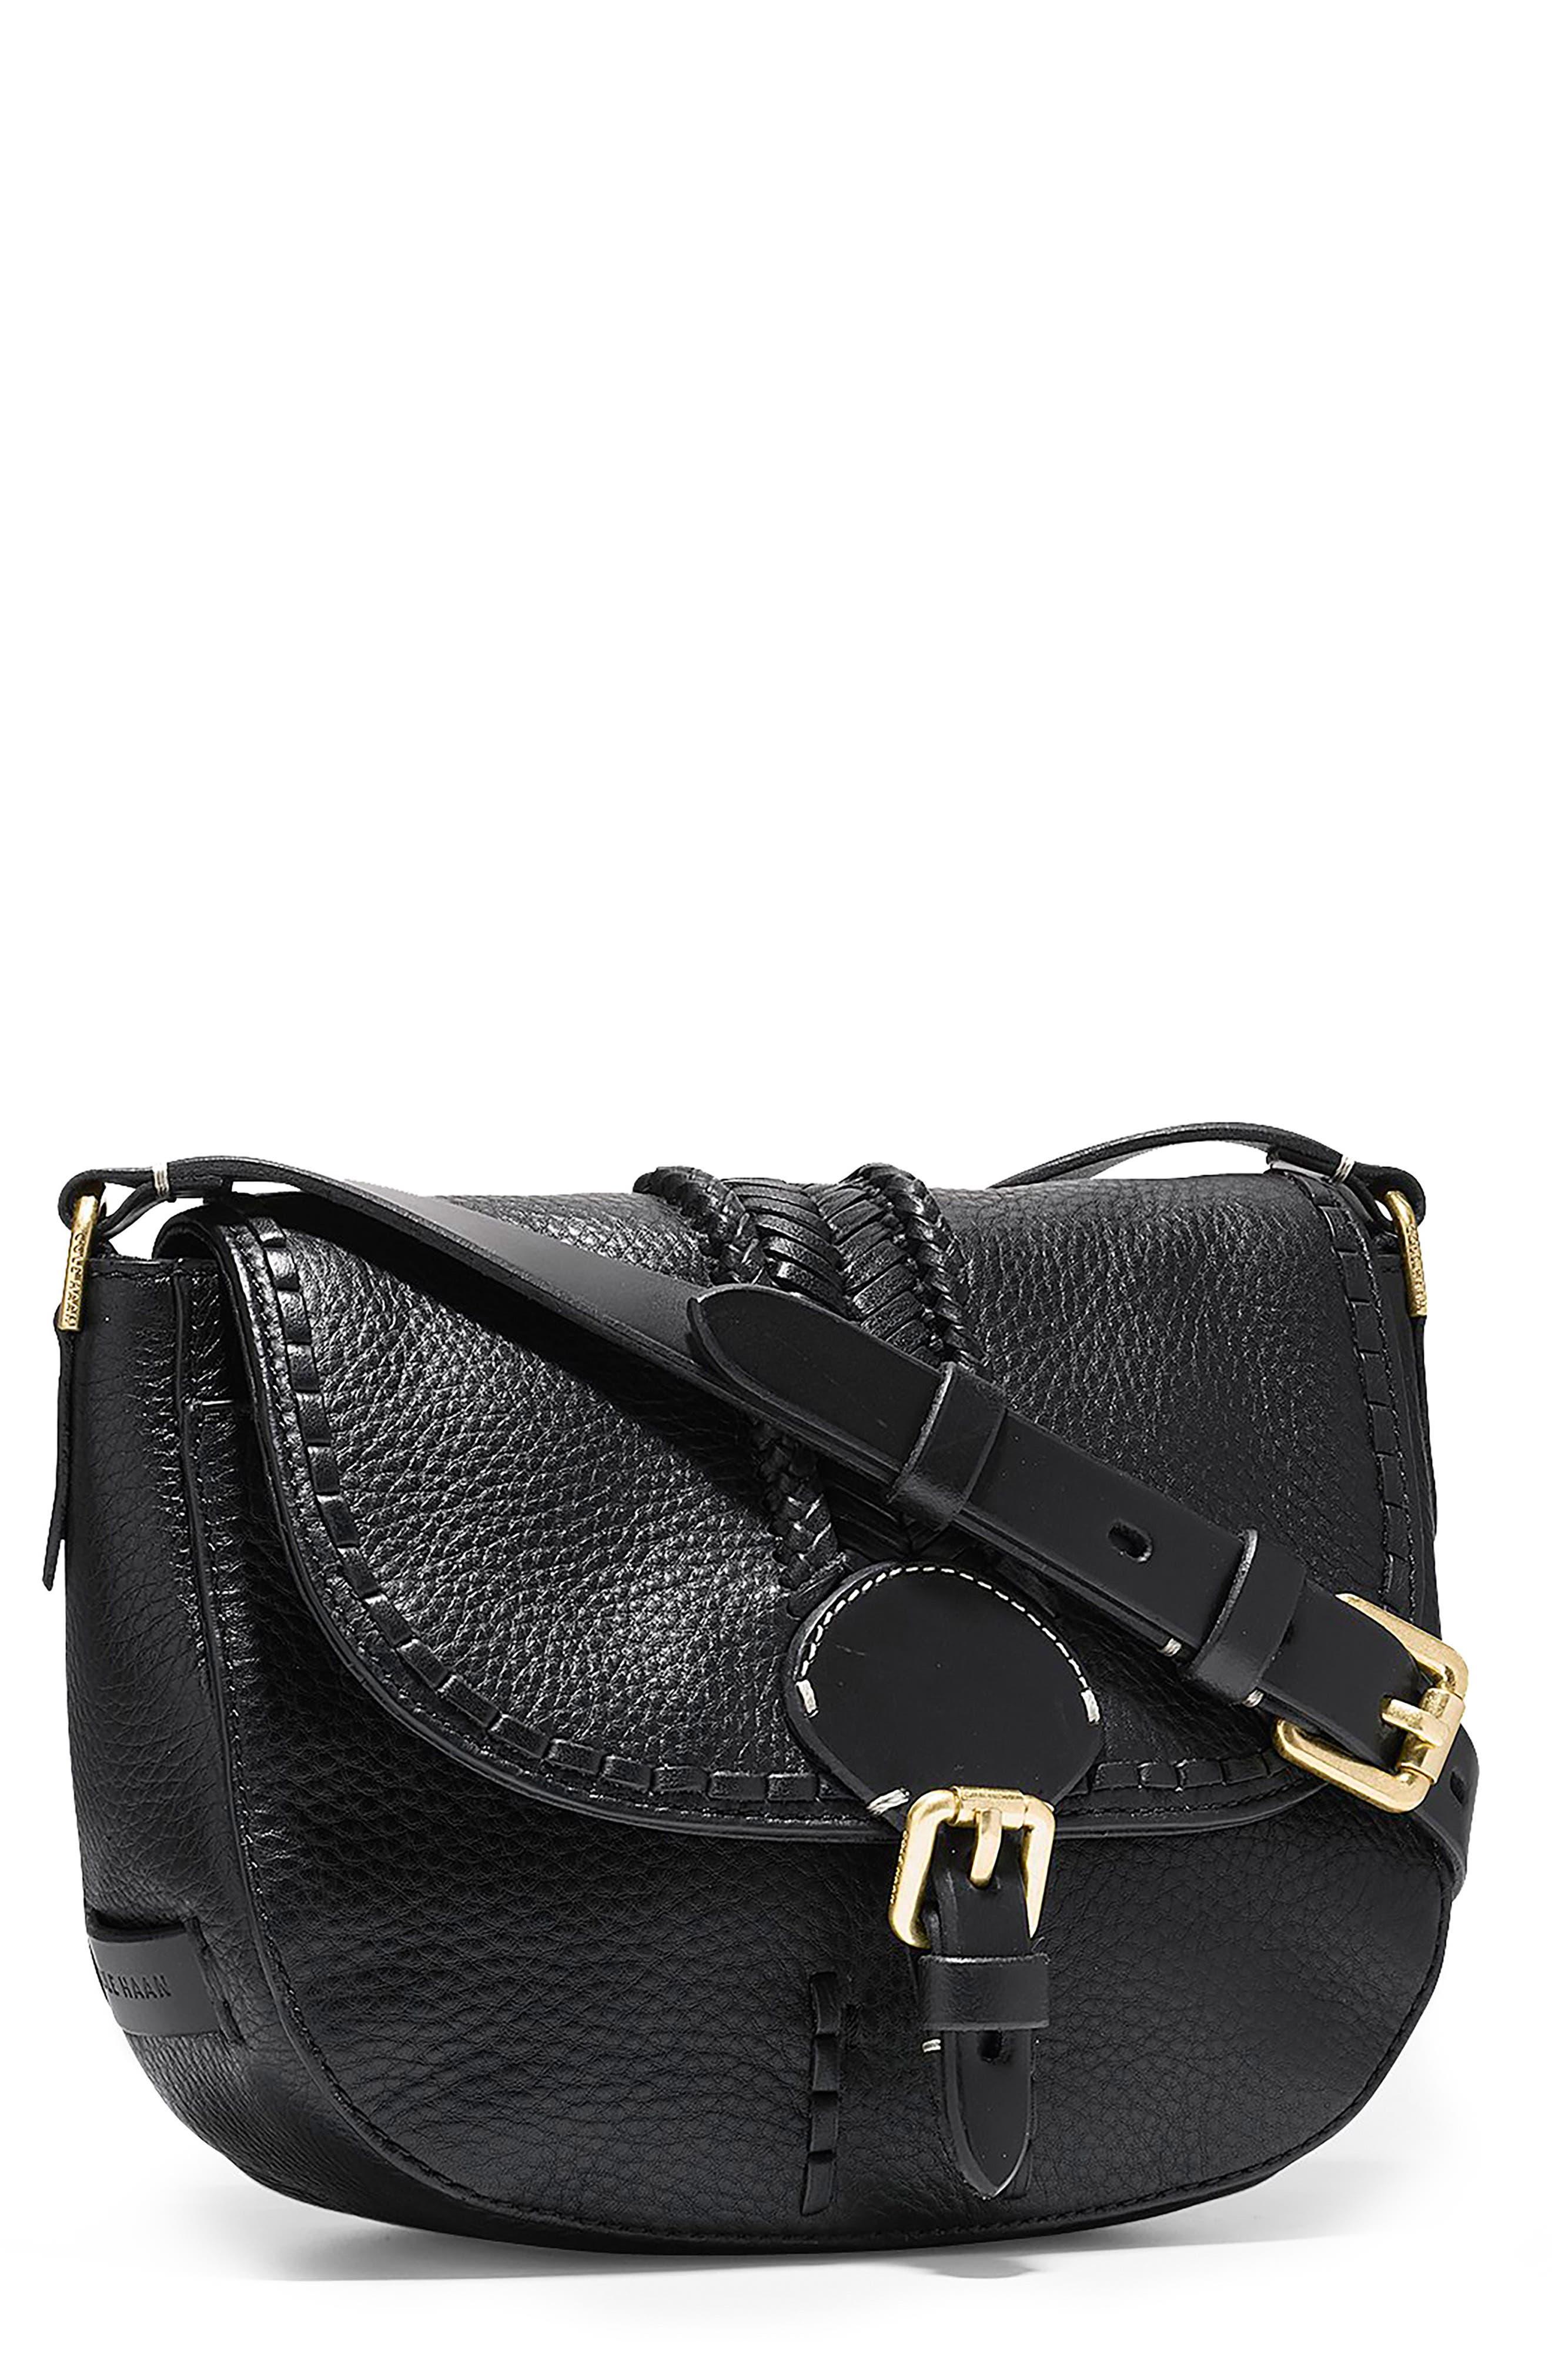 Mini Loralie Whipstitch Leather Saddle Bag,                             Main thumbnail 1, color,                             001